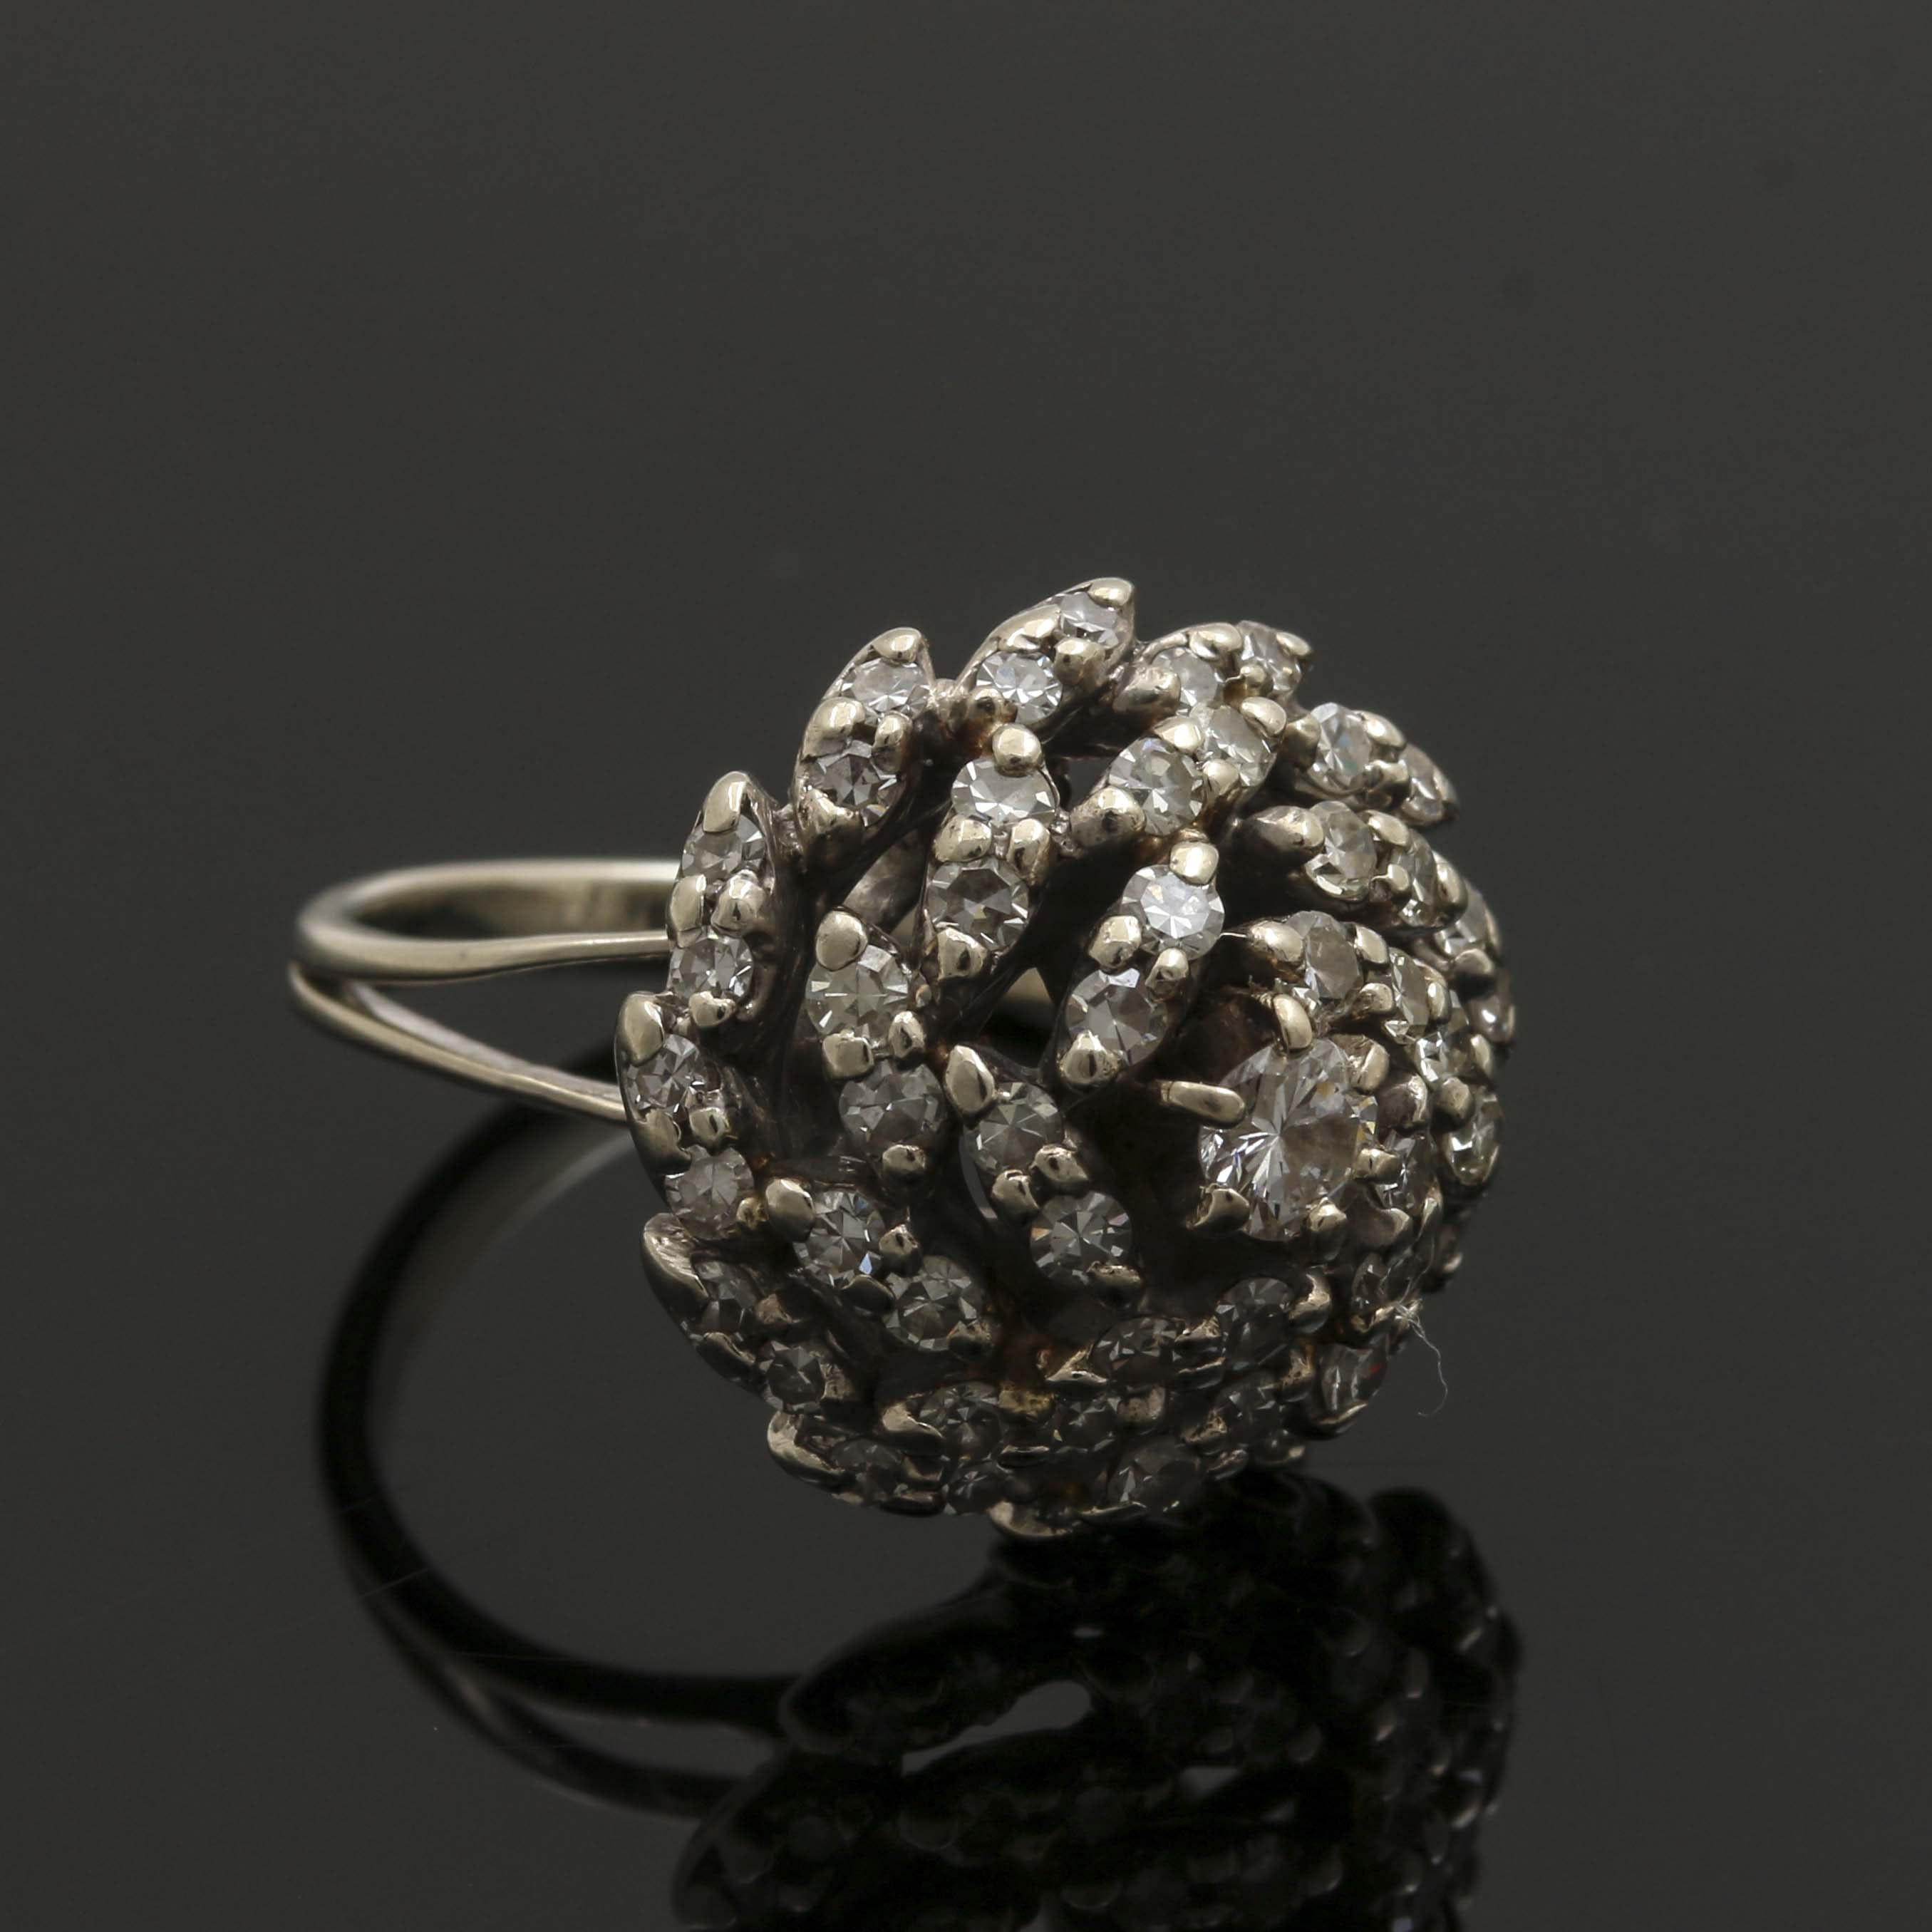 14K White Gold Diamond Cocktail Ring